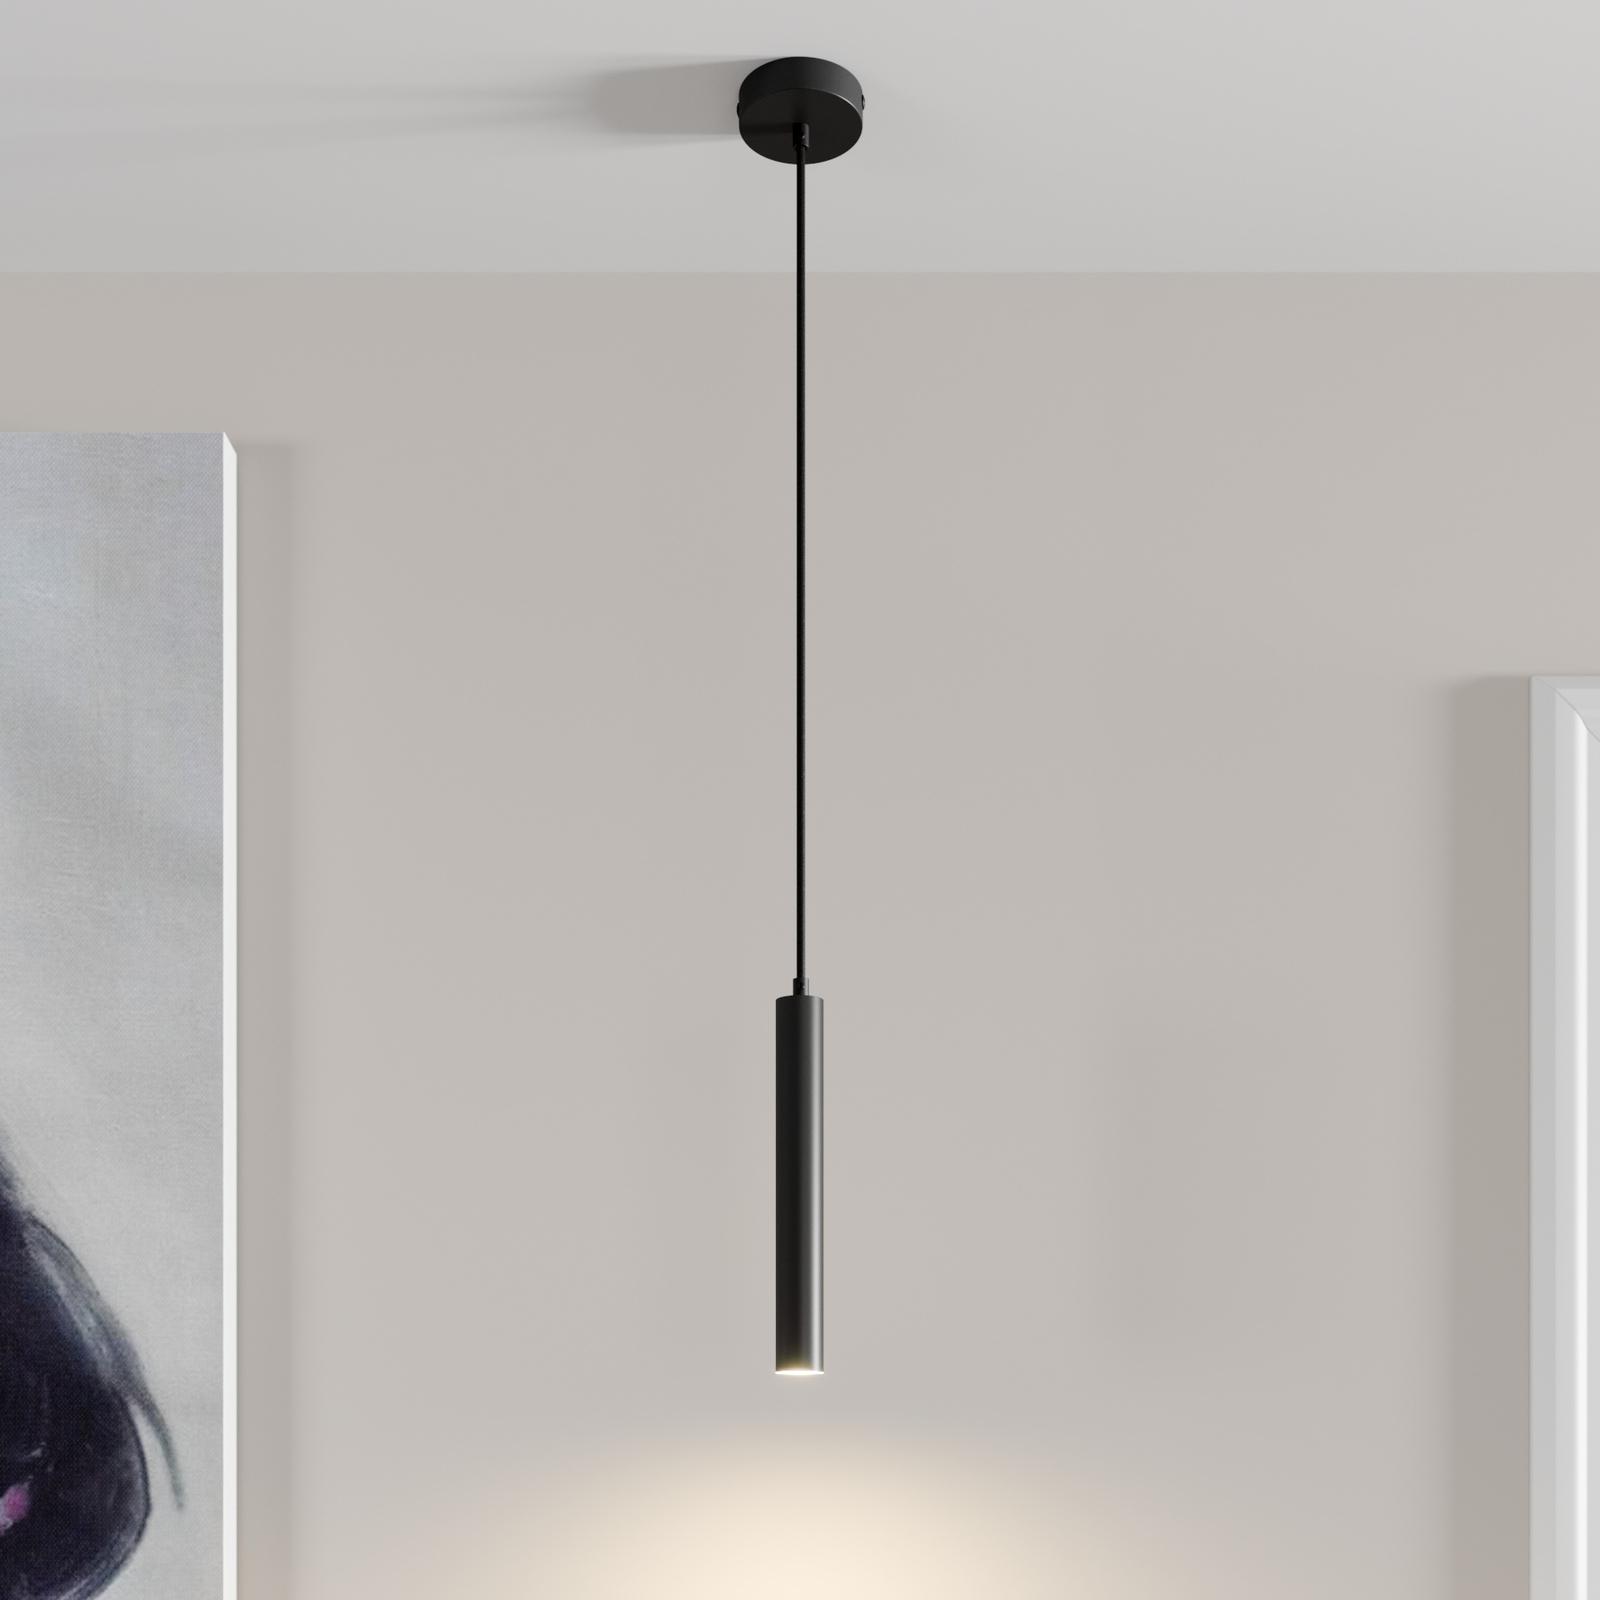 Arcchio Franka LED hanglamp, 1-lamp